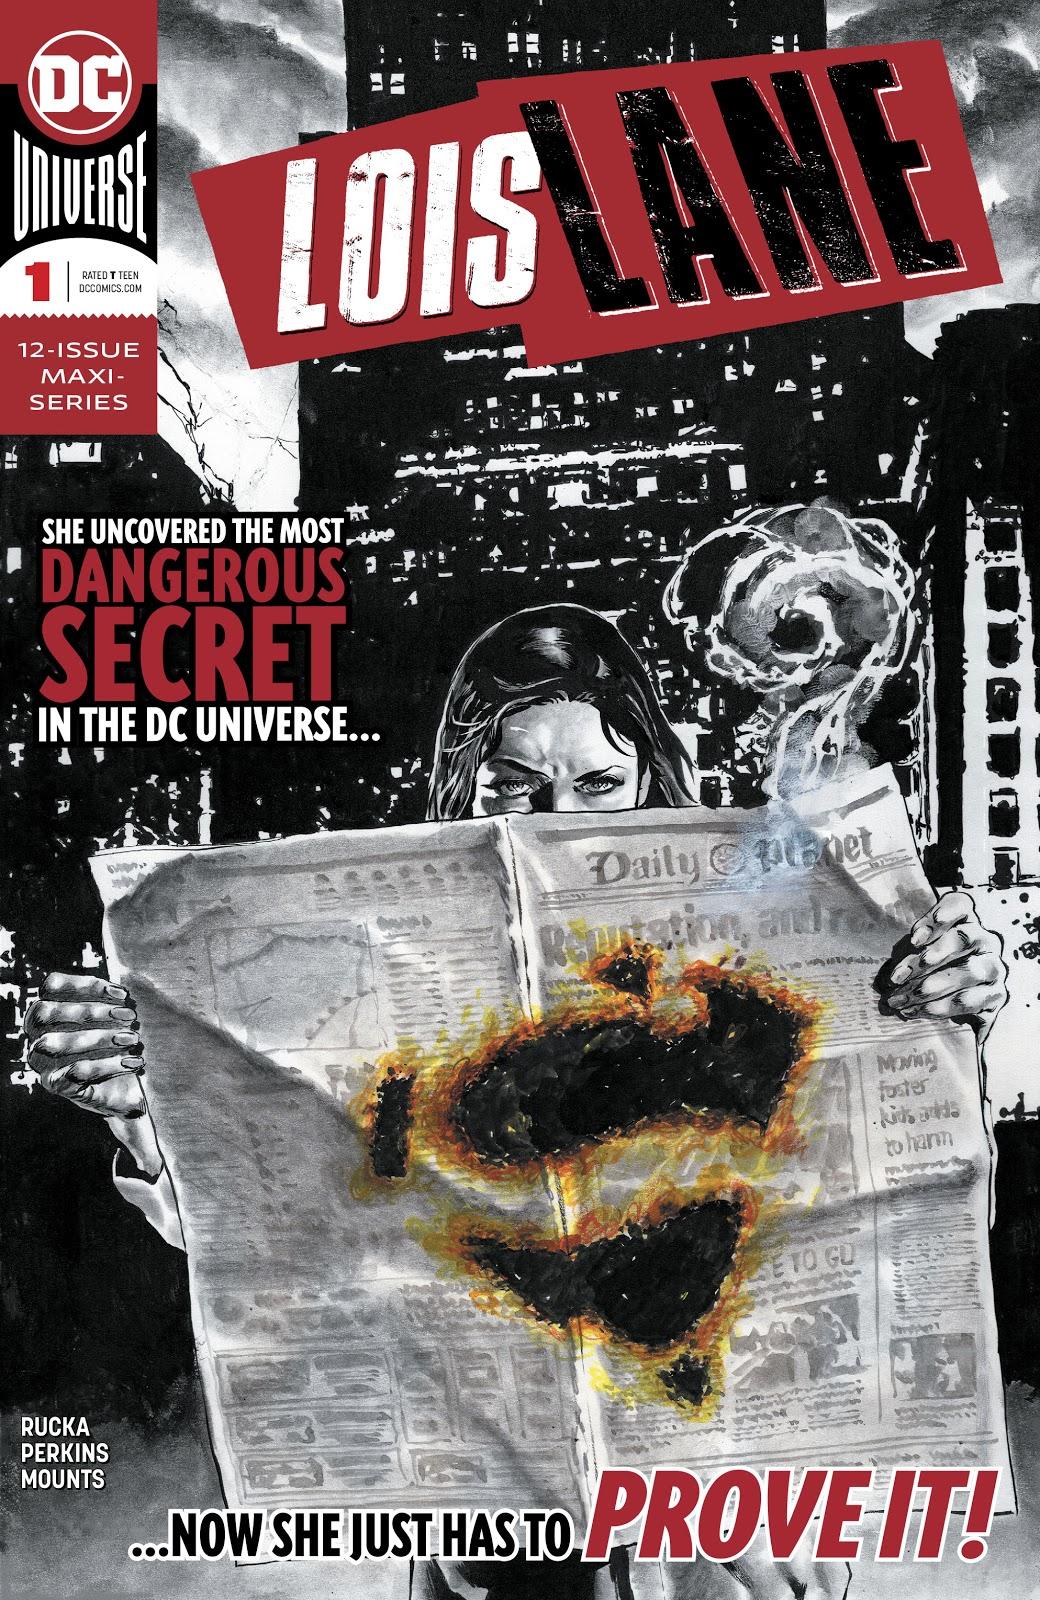 Lois Lane Cover   Credit: DC Comics, Jerry Siegel, Joe Shuster